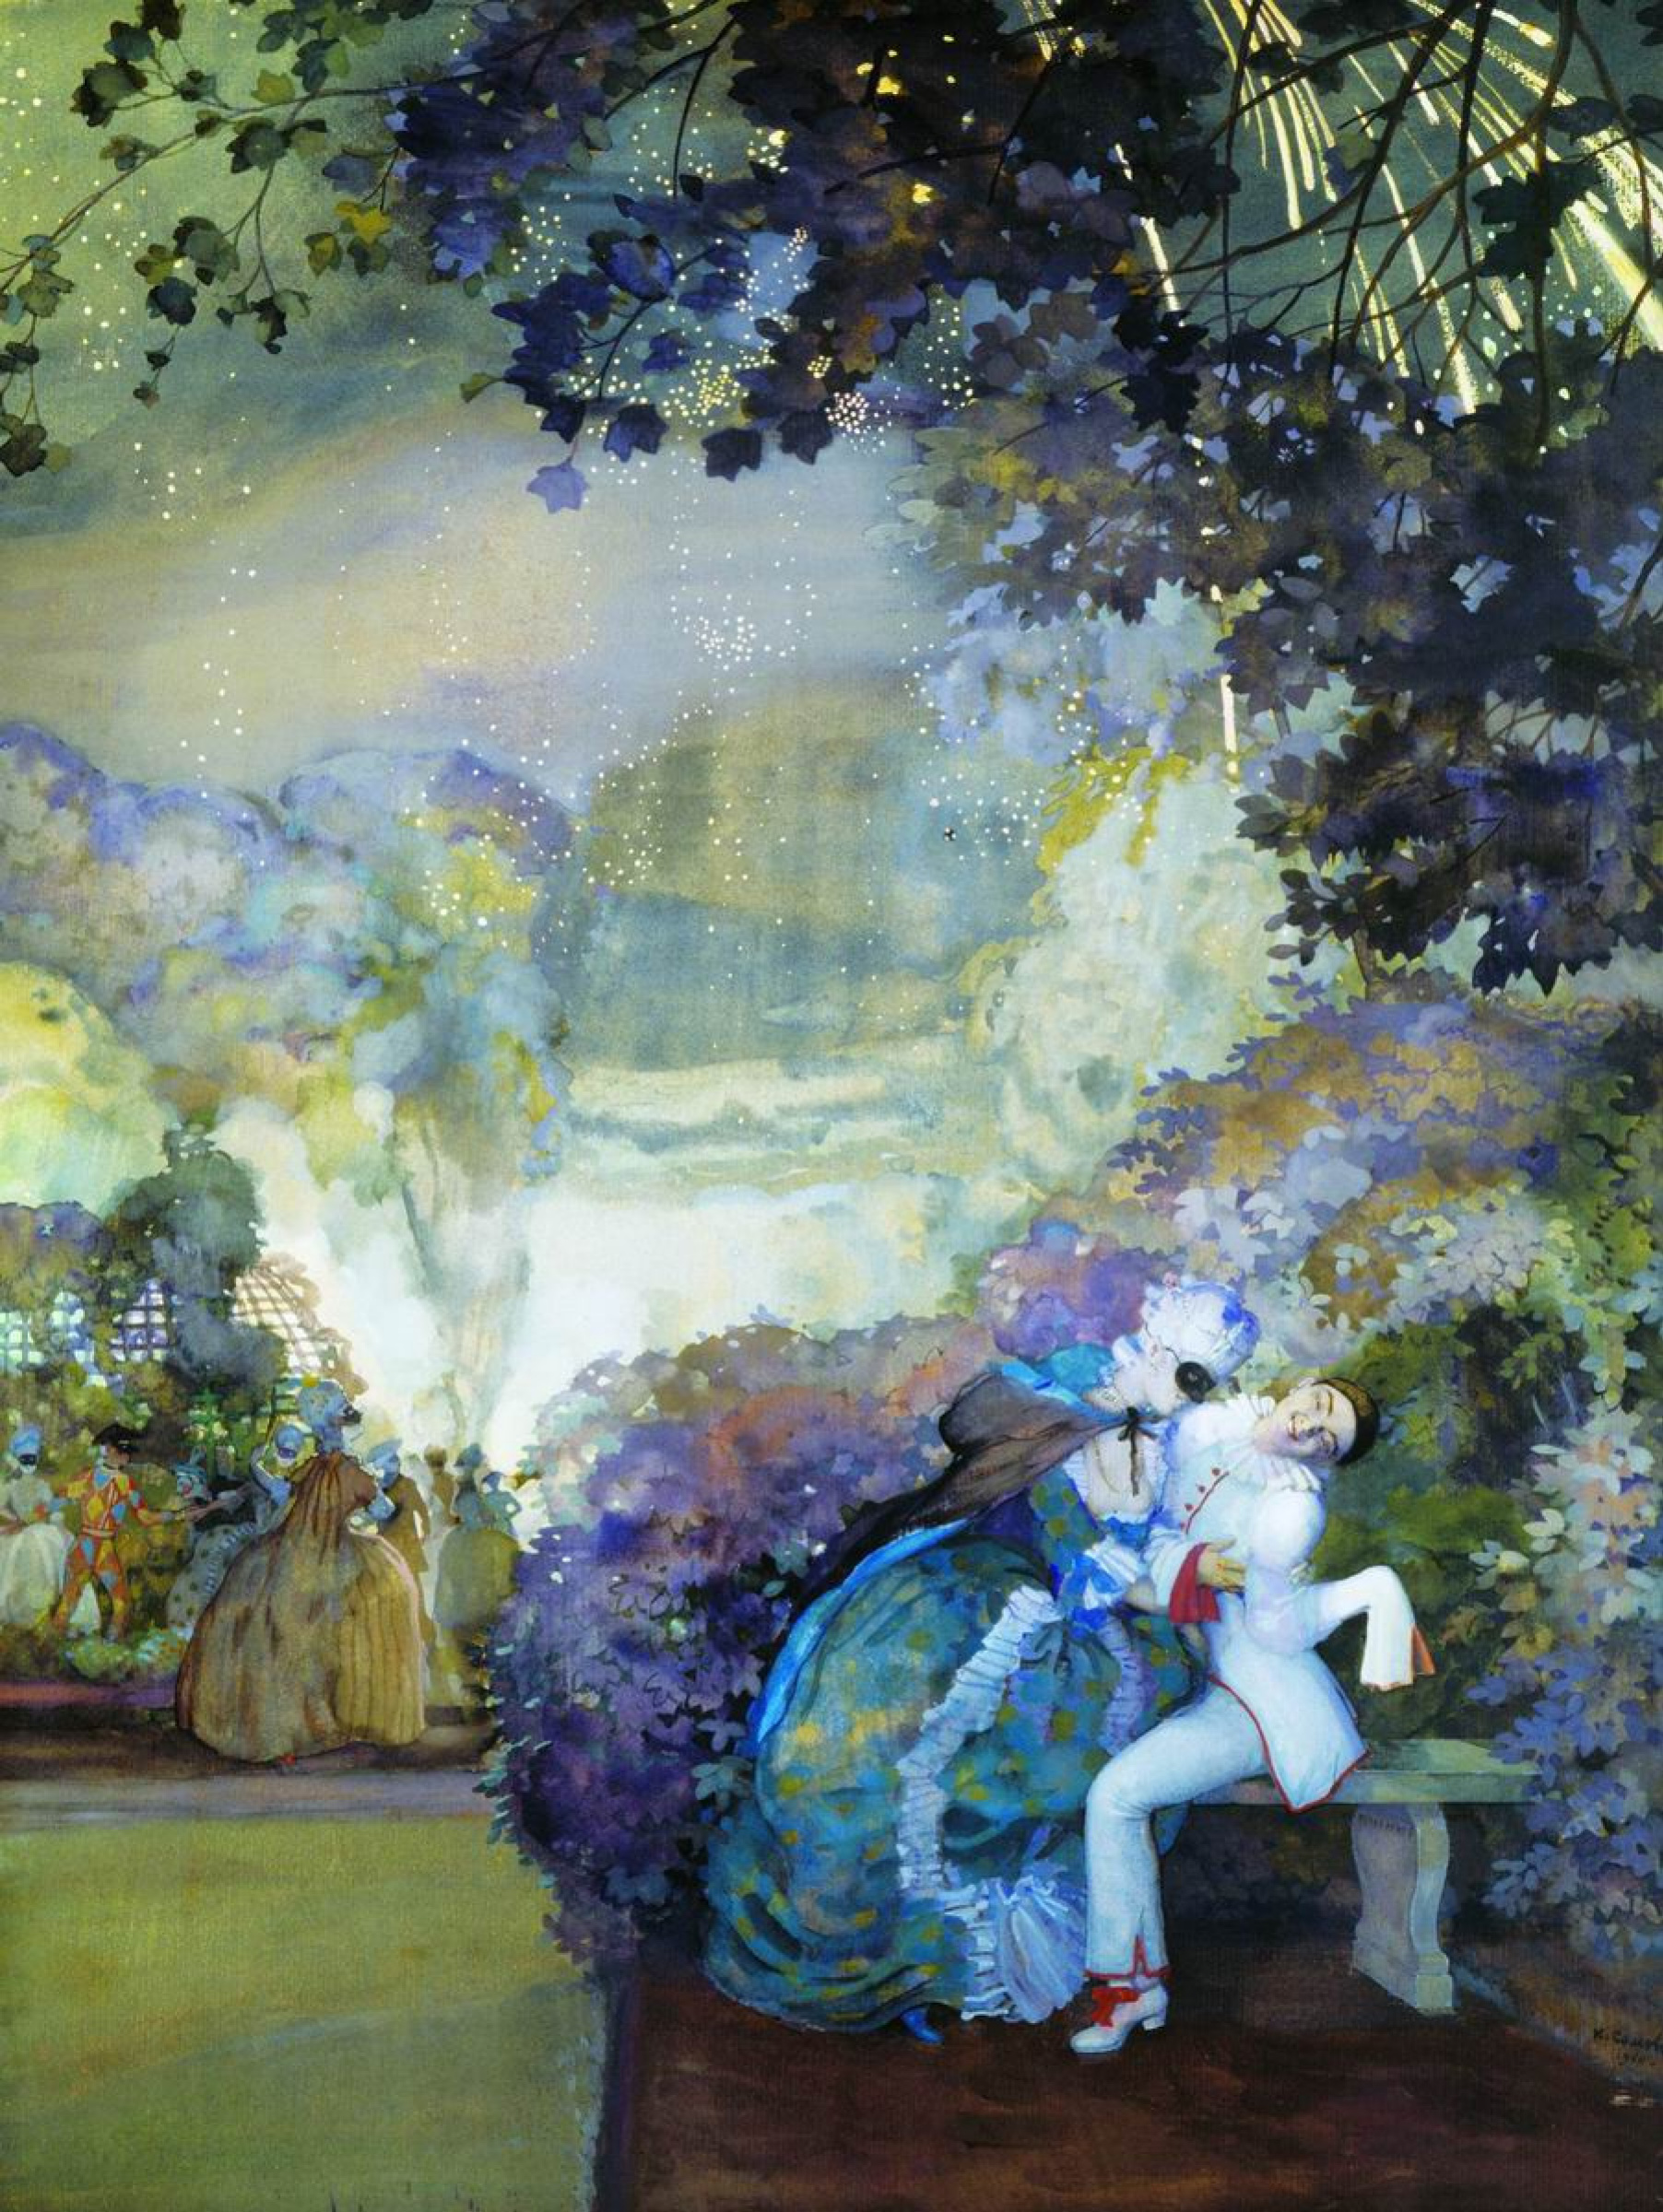 Konstantin Somov, Pierrot and Lady, 1910, Odessa Finearts museum, Odessa, Ukraine.